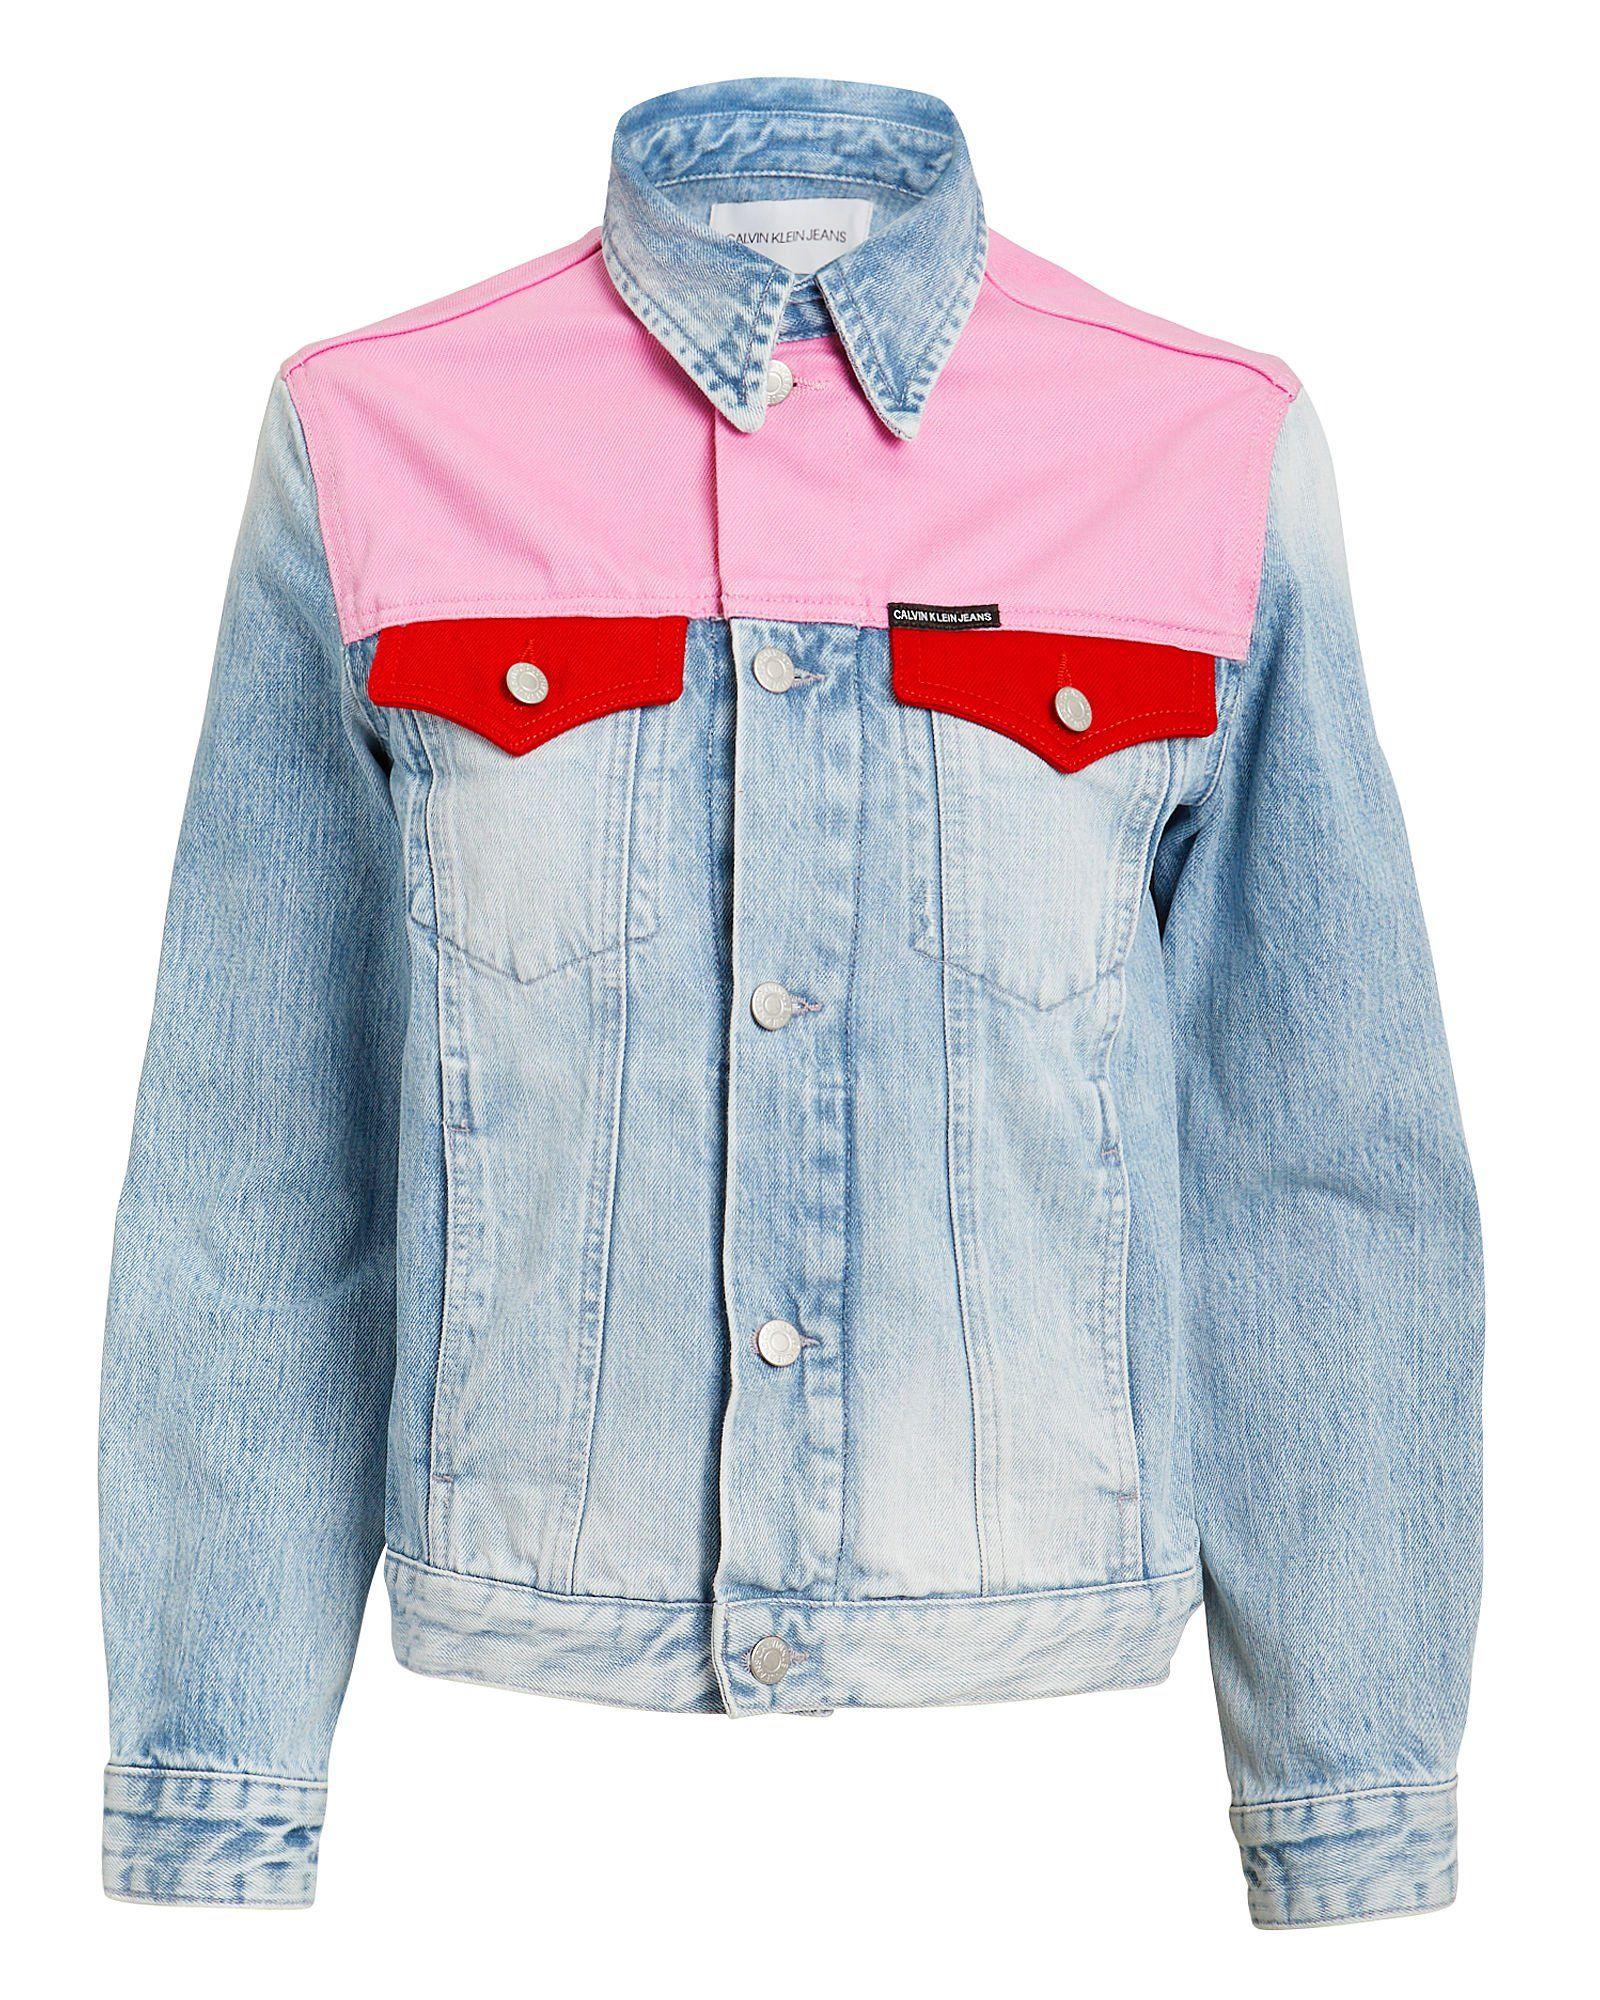 Colorblock Denim Jacket Denim Jacket Denim Design Jackets [ 2000 x 1600 Pixel ]